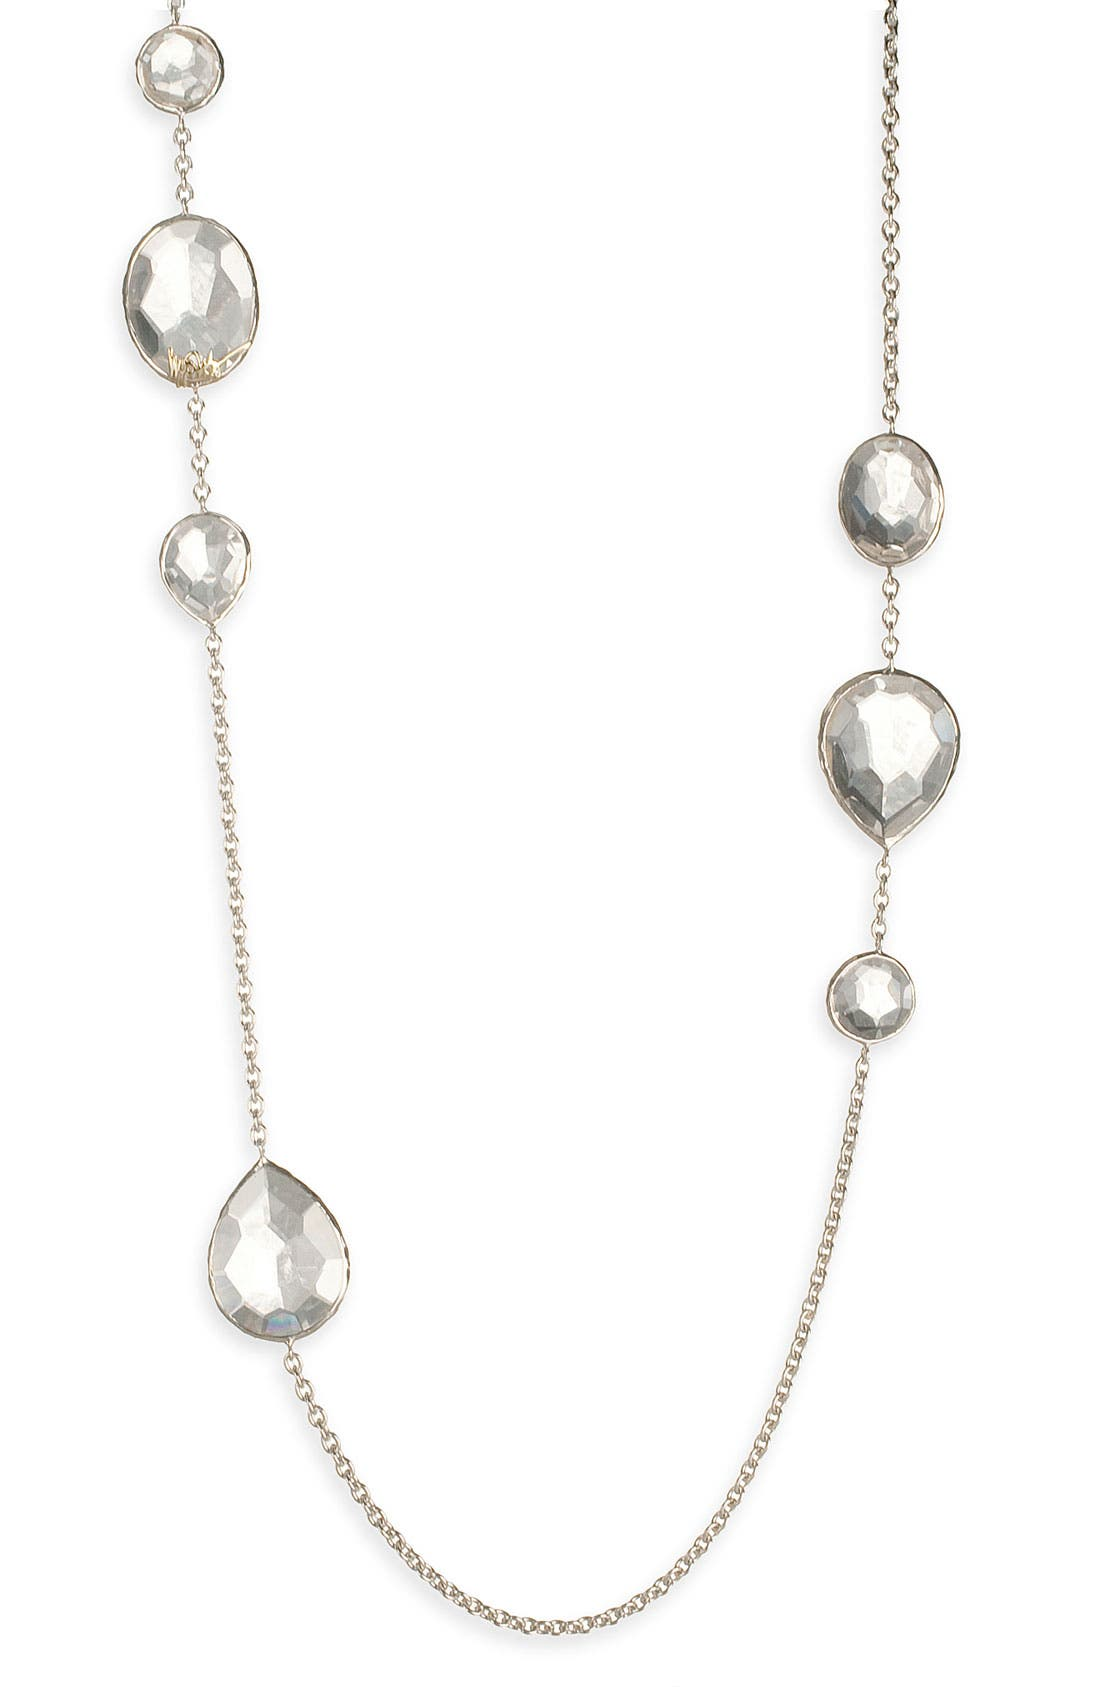 Alternate Image 1 Selected - Ippolita 'Rock Candy - Gelato' Station Long Necklace